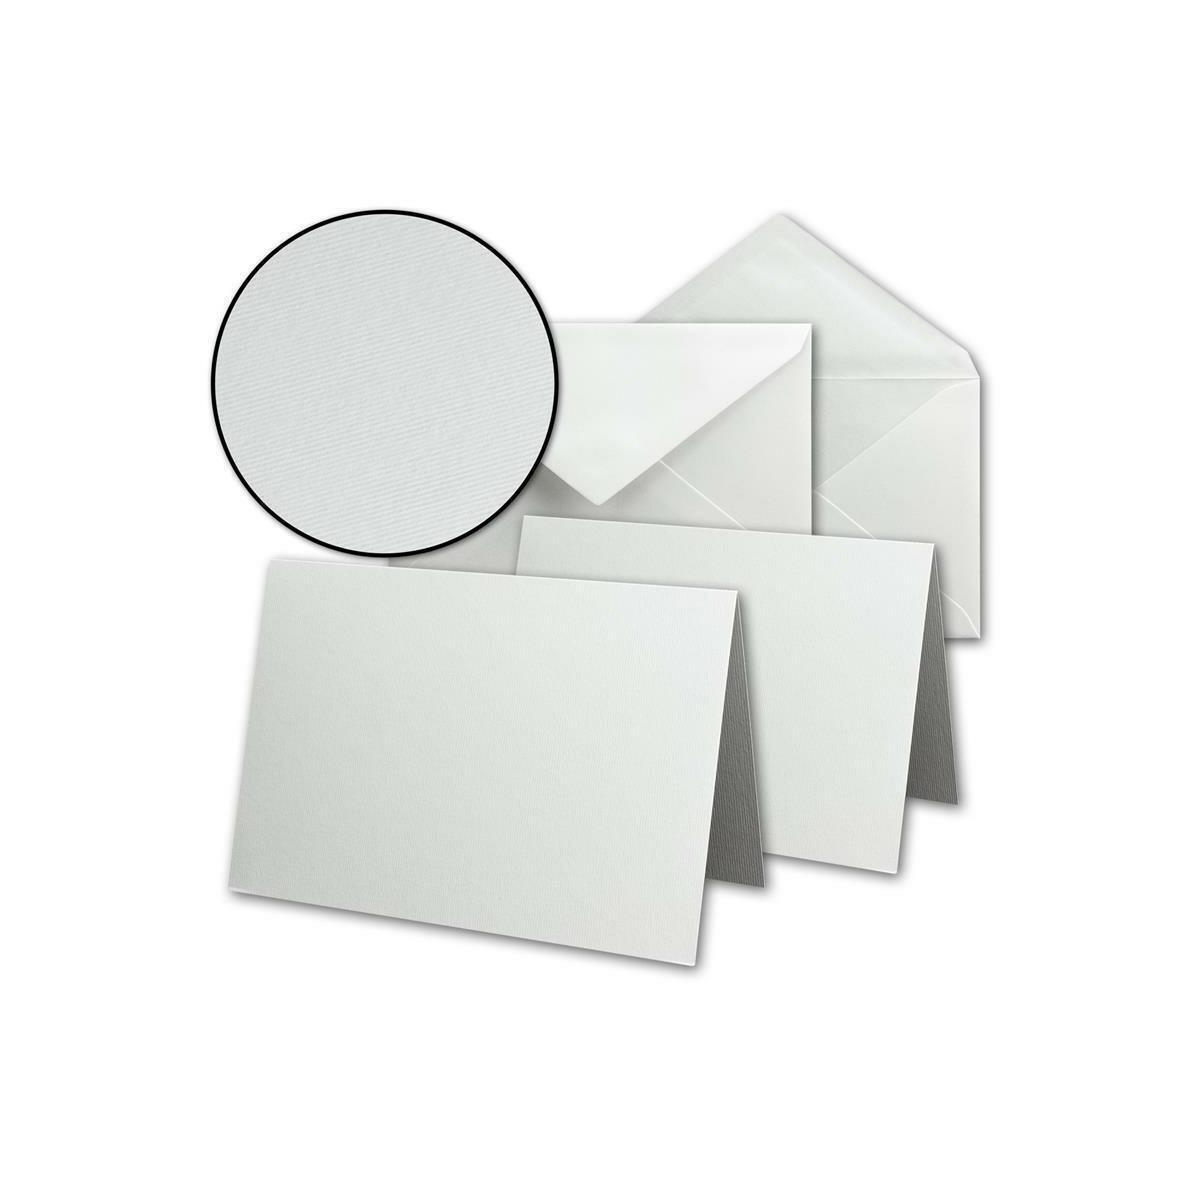 50 Doppelkarten DIN Lang reinweiß 250 g//m²  Klappkarten Faltkarten